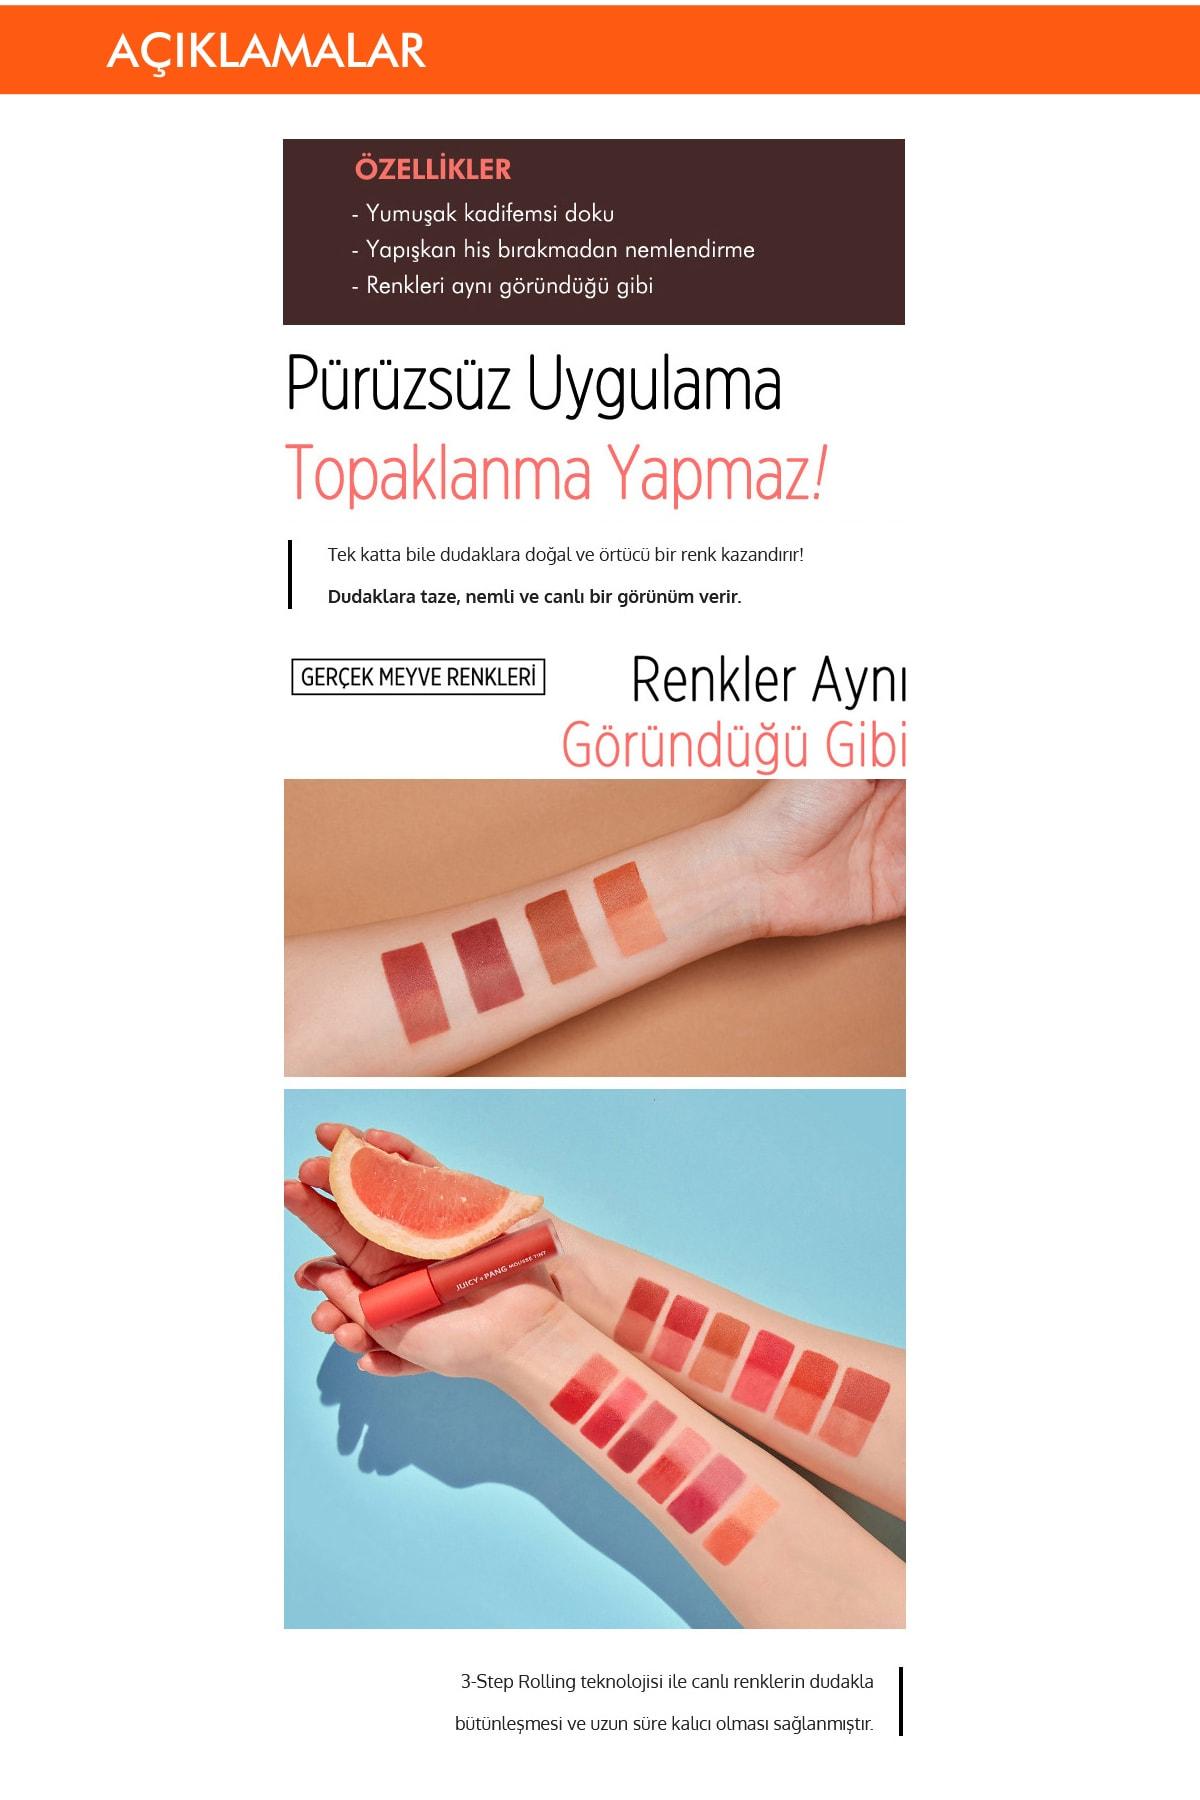 Missha Pürüzsüz Görünüm Sunan Kalıcı Köpük Tint  Ruj APIEU Juicy Pang Mousse Tint (BE01) 3